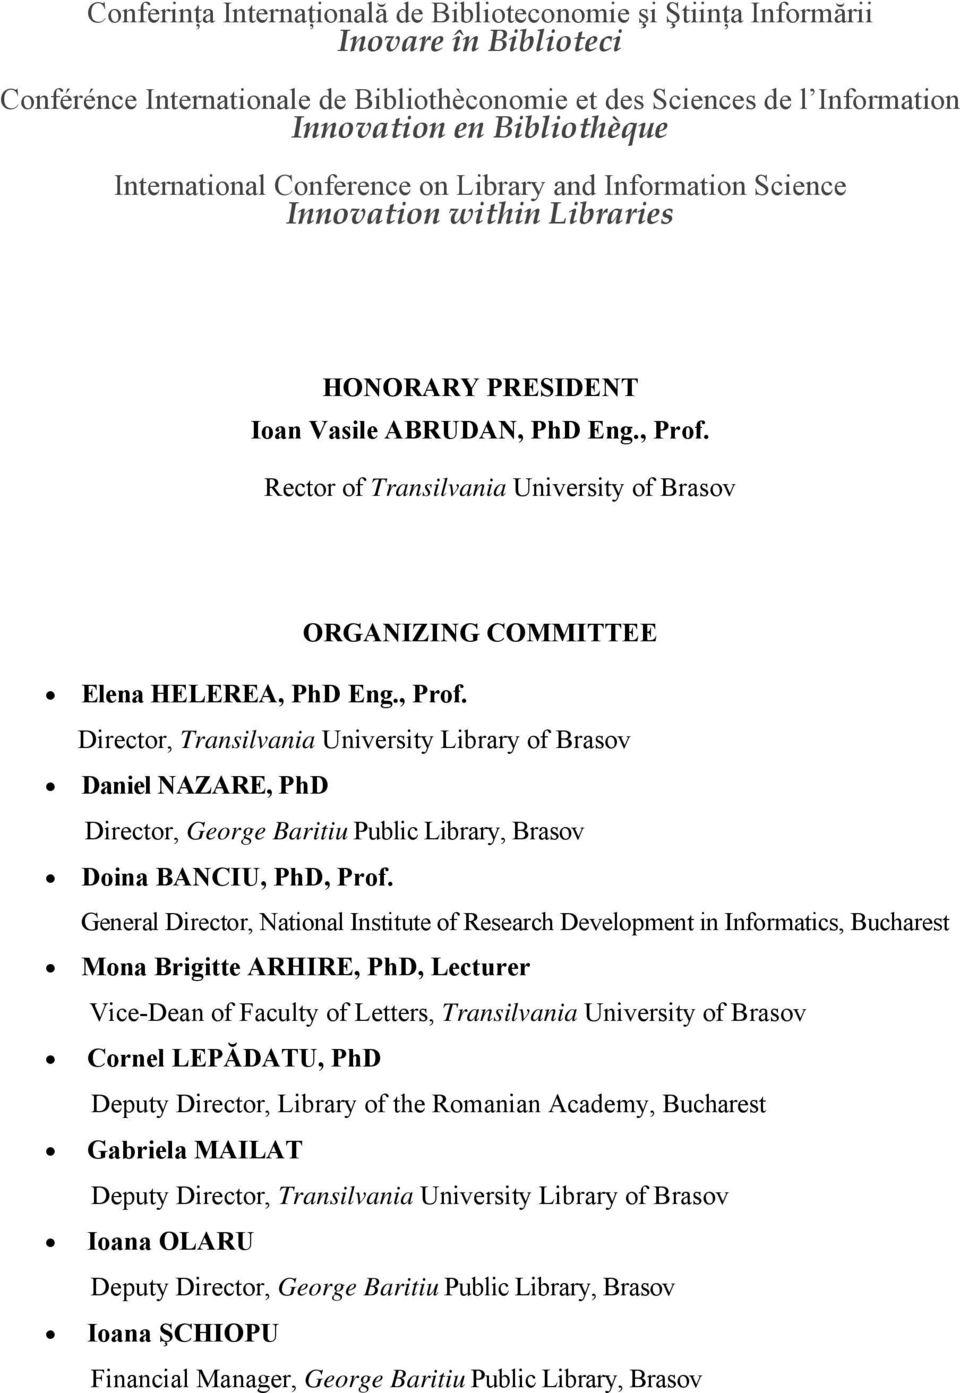 Biblio 2012 Innovation En Bibliotheque Innovation Within